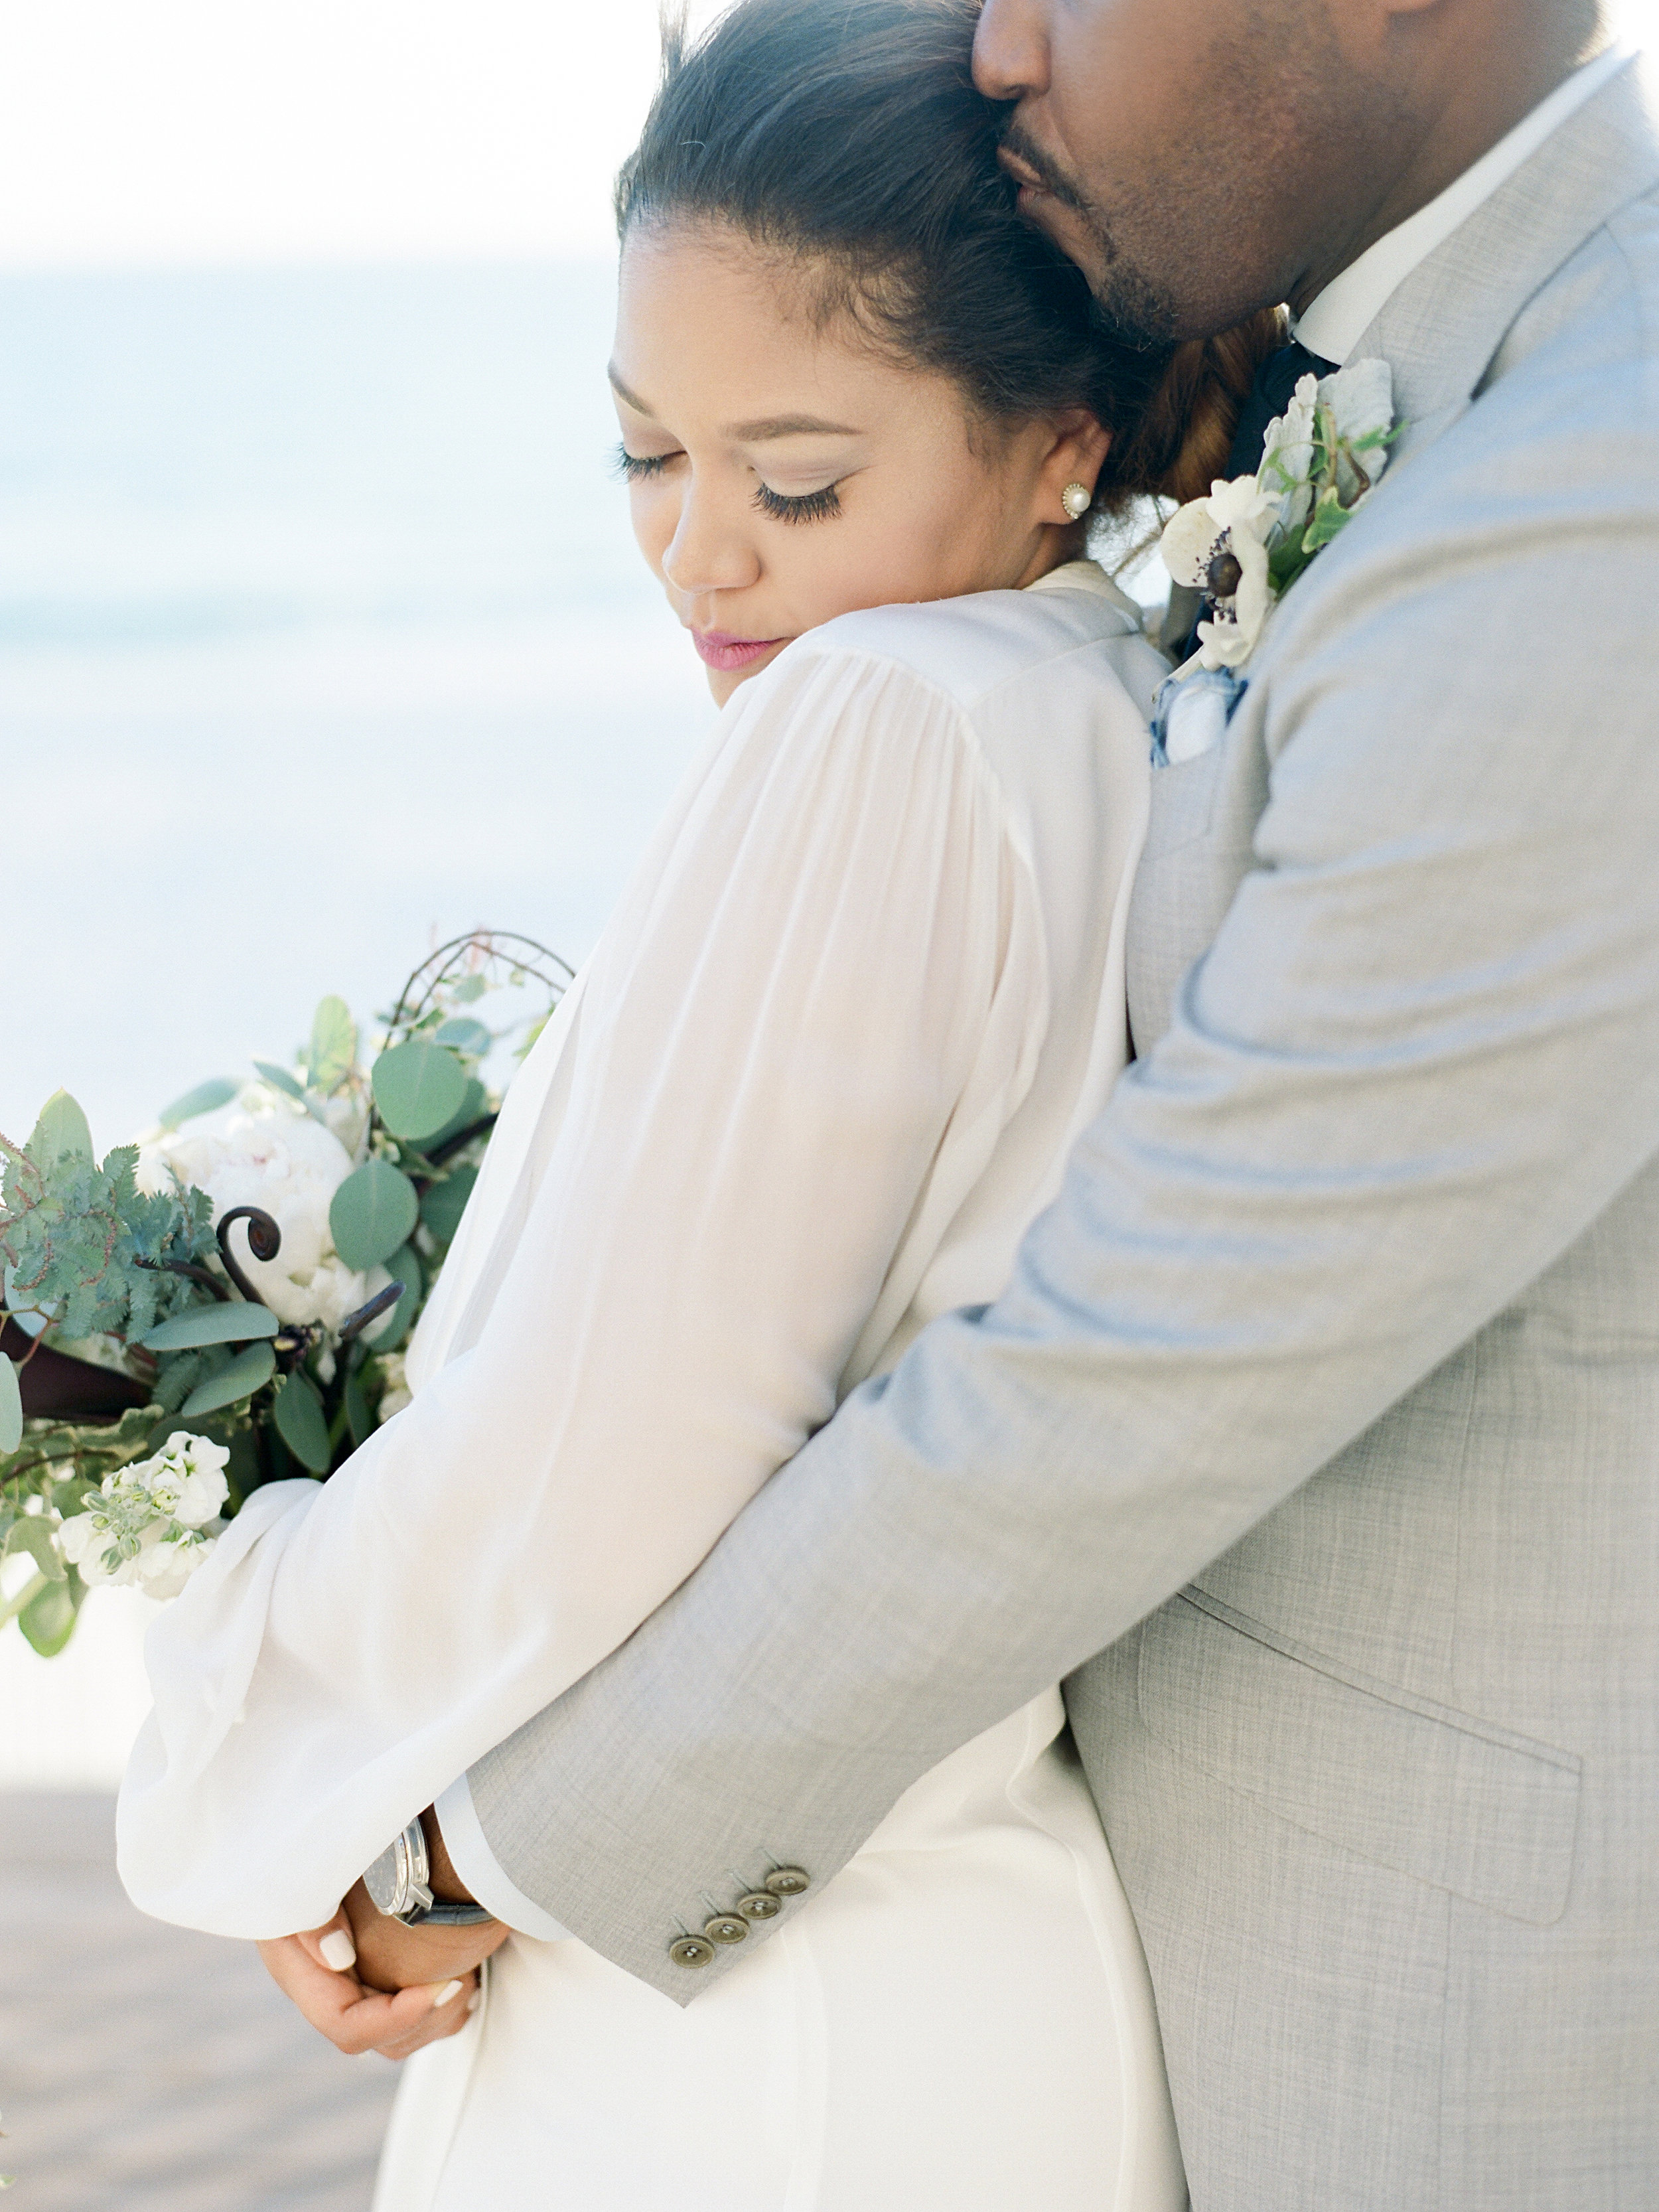 casandra_and_andy_carillon_beach_wedding_photographer_shannon_griffin_bride_and_groom-35.jpg